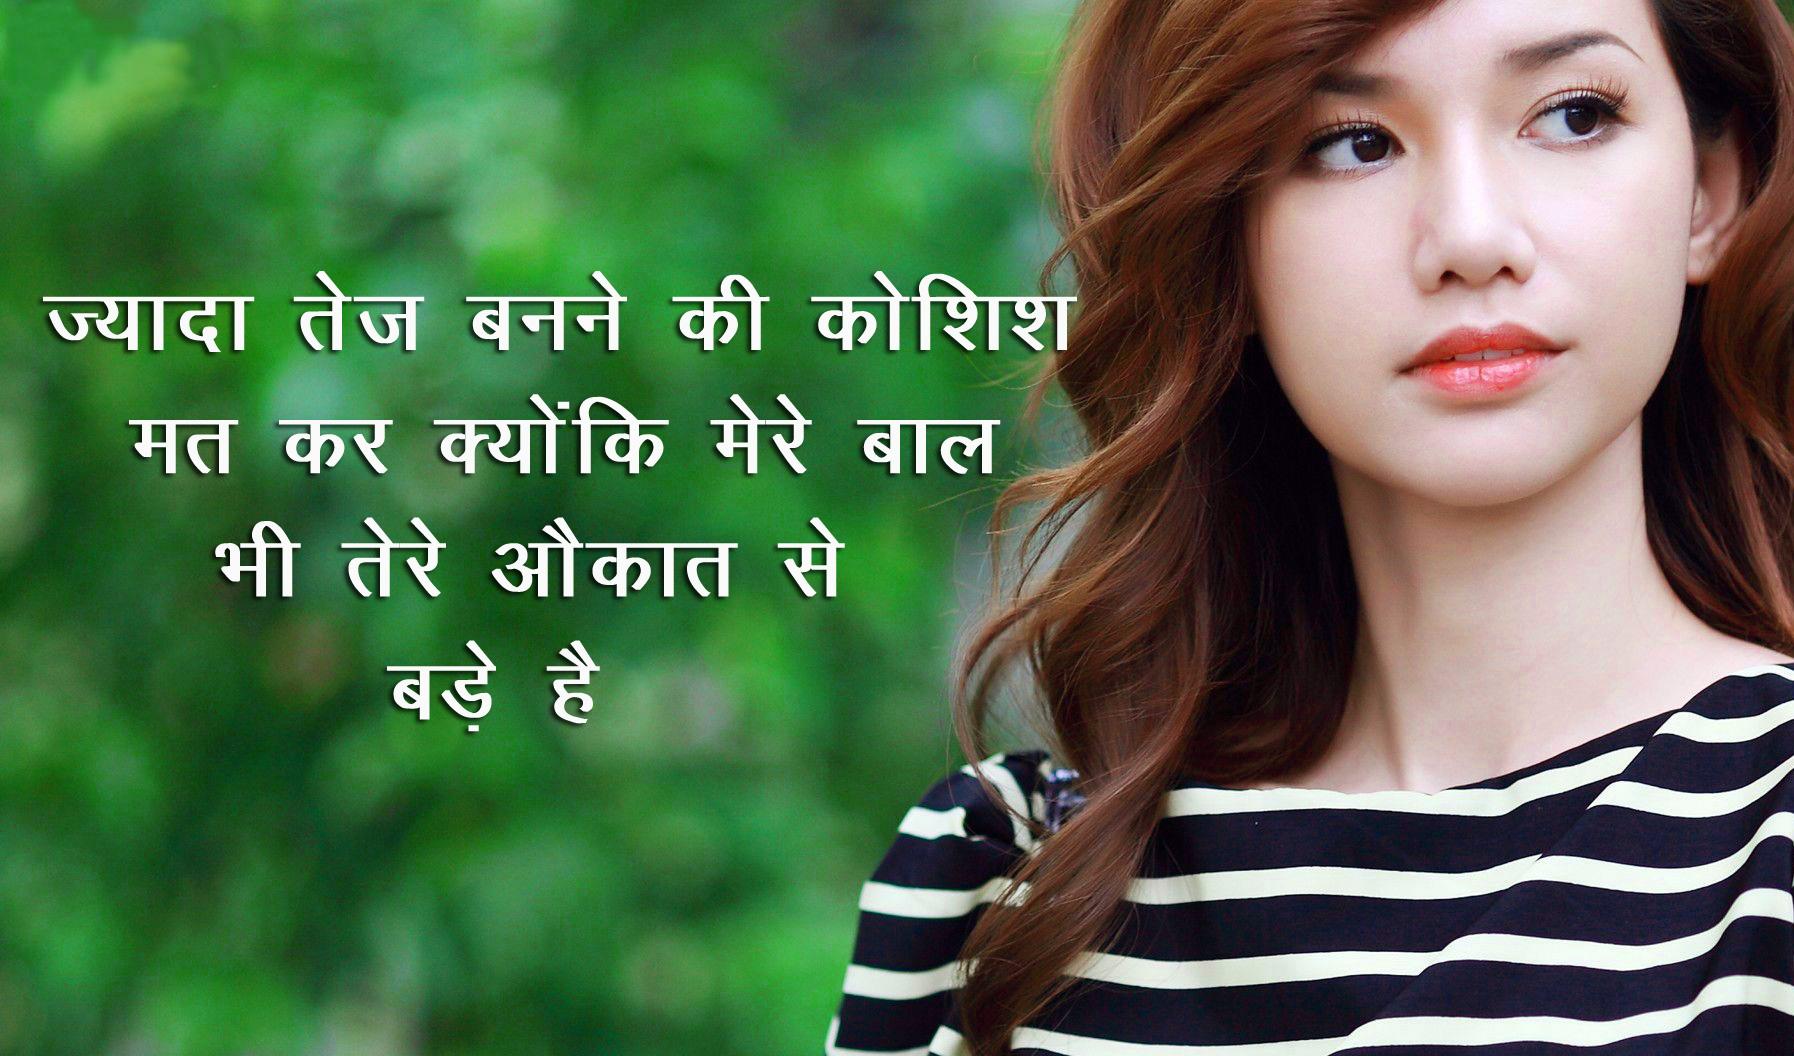 Girls Free Whataapp Status photo Download